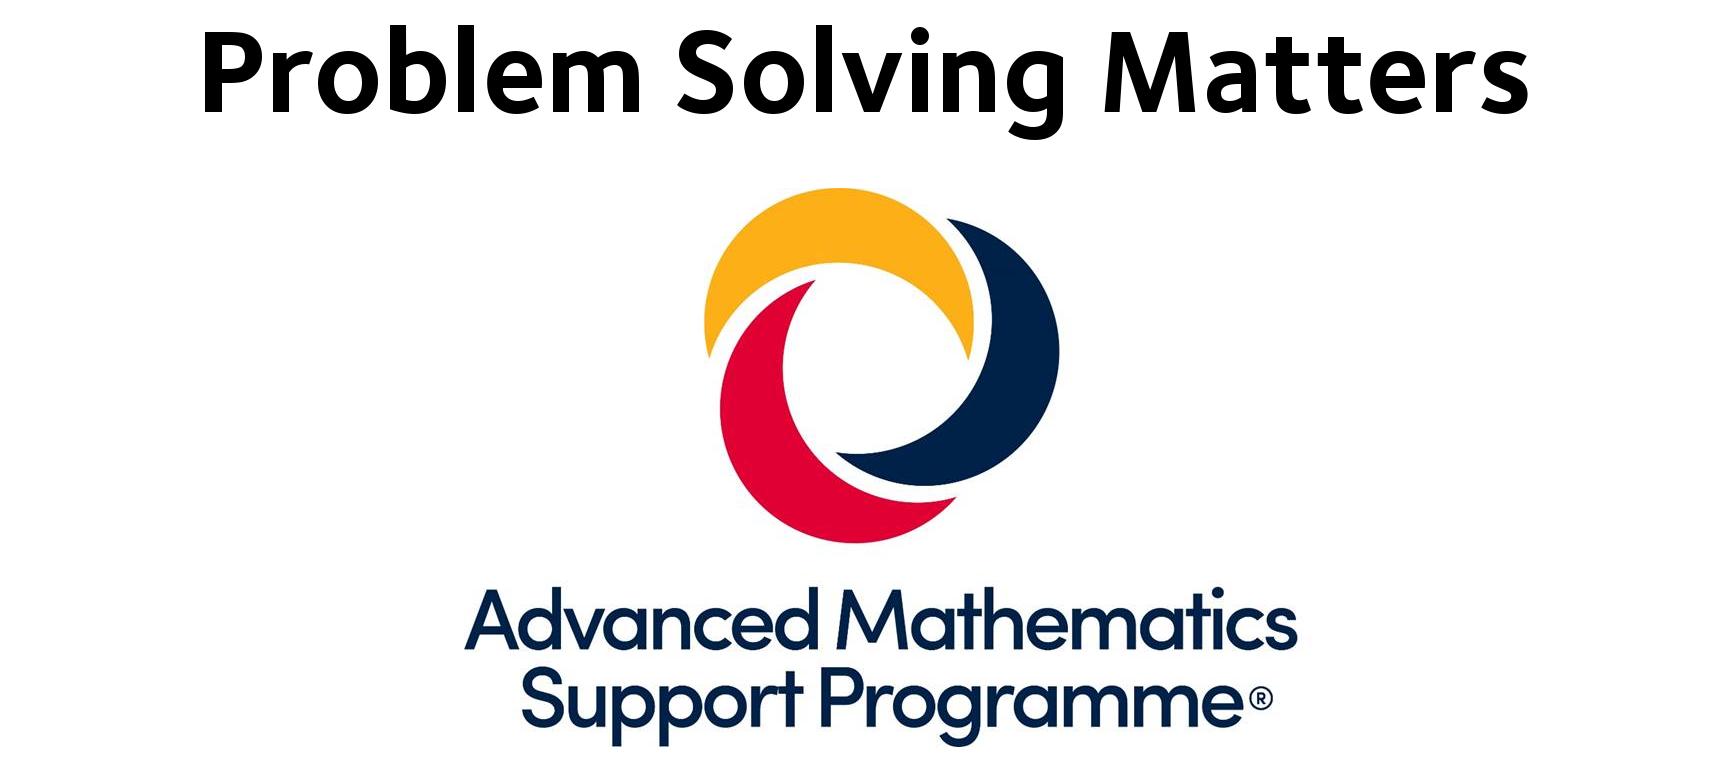 logo for Problem Solving Matters